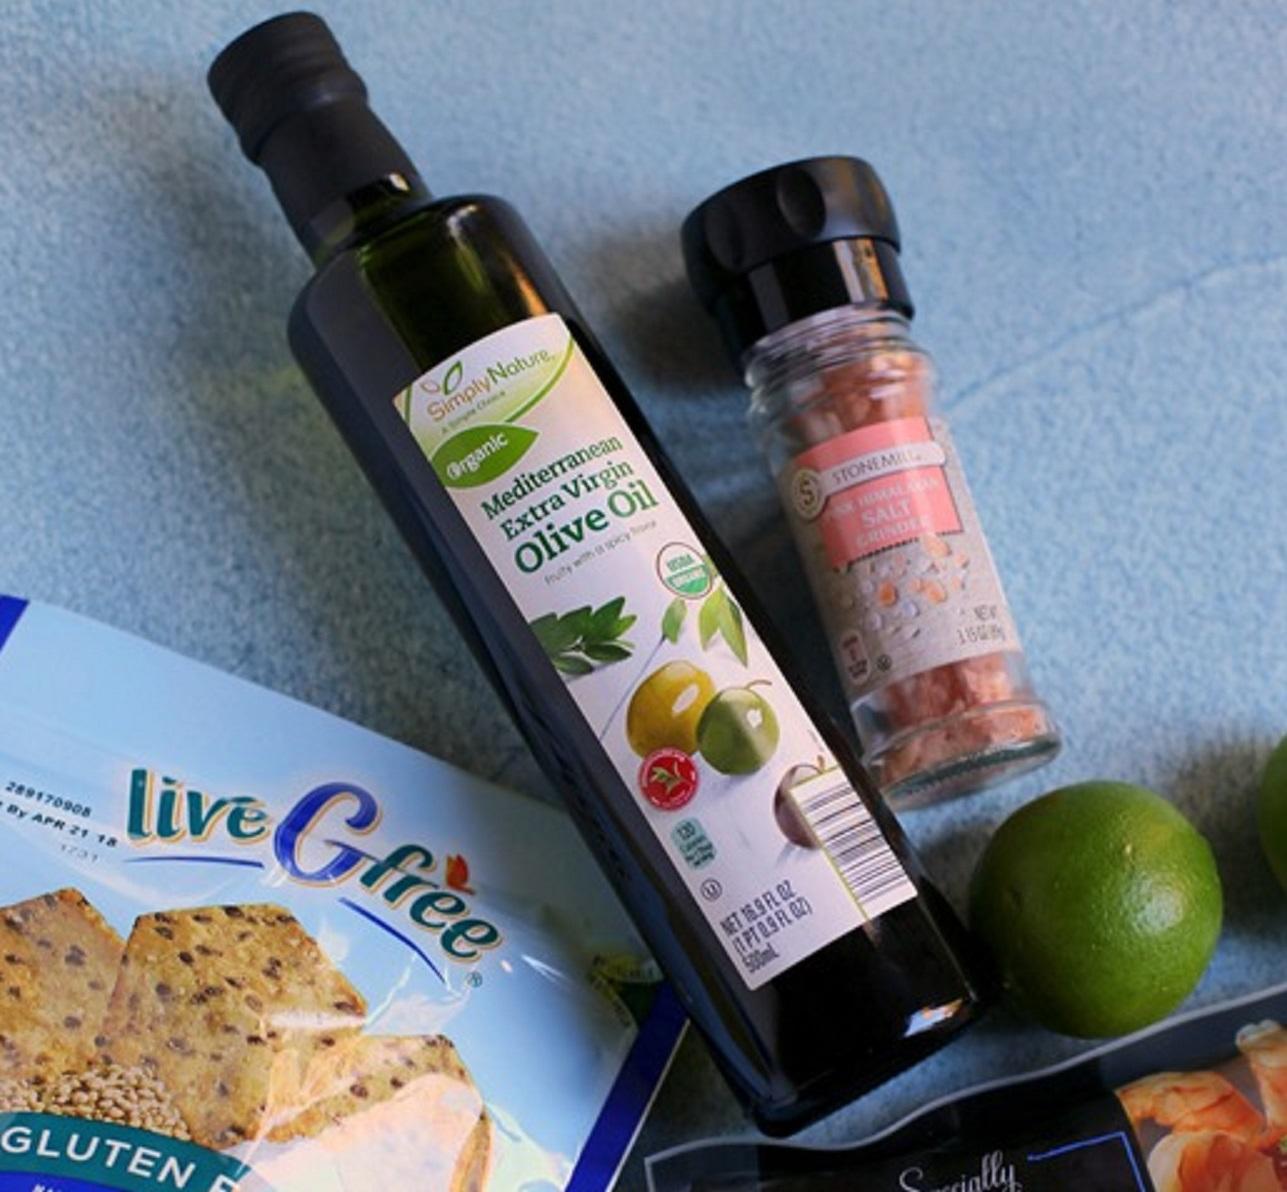 Mediterranean Extra Virgin Olive Oil next to Pink Himalayan salt.